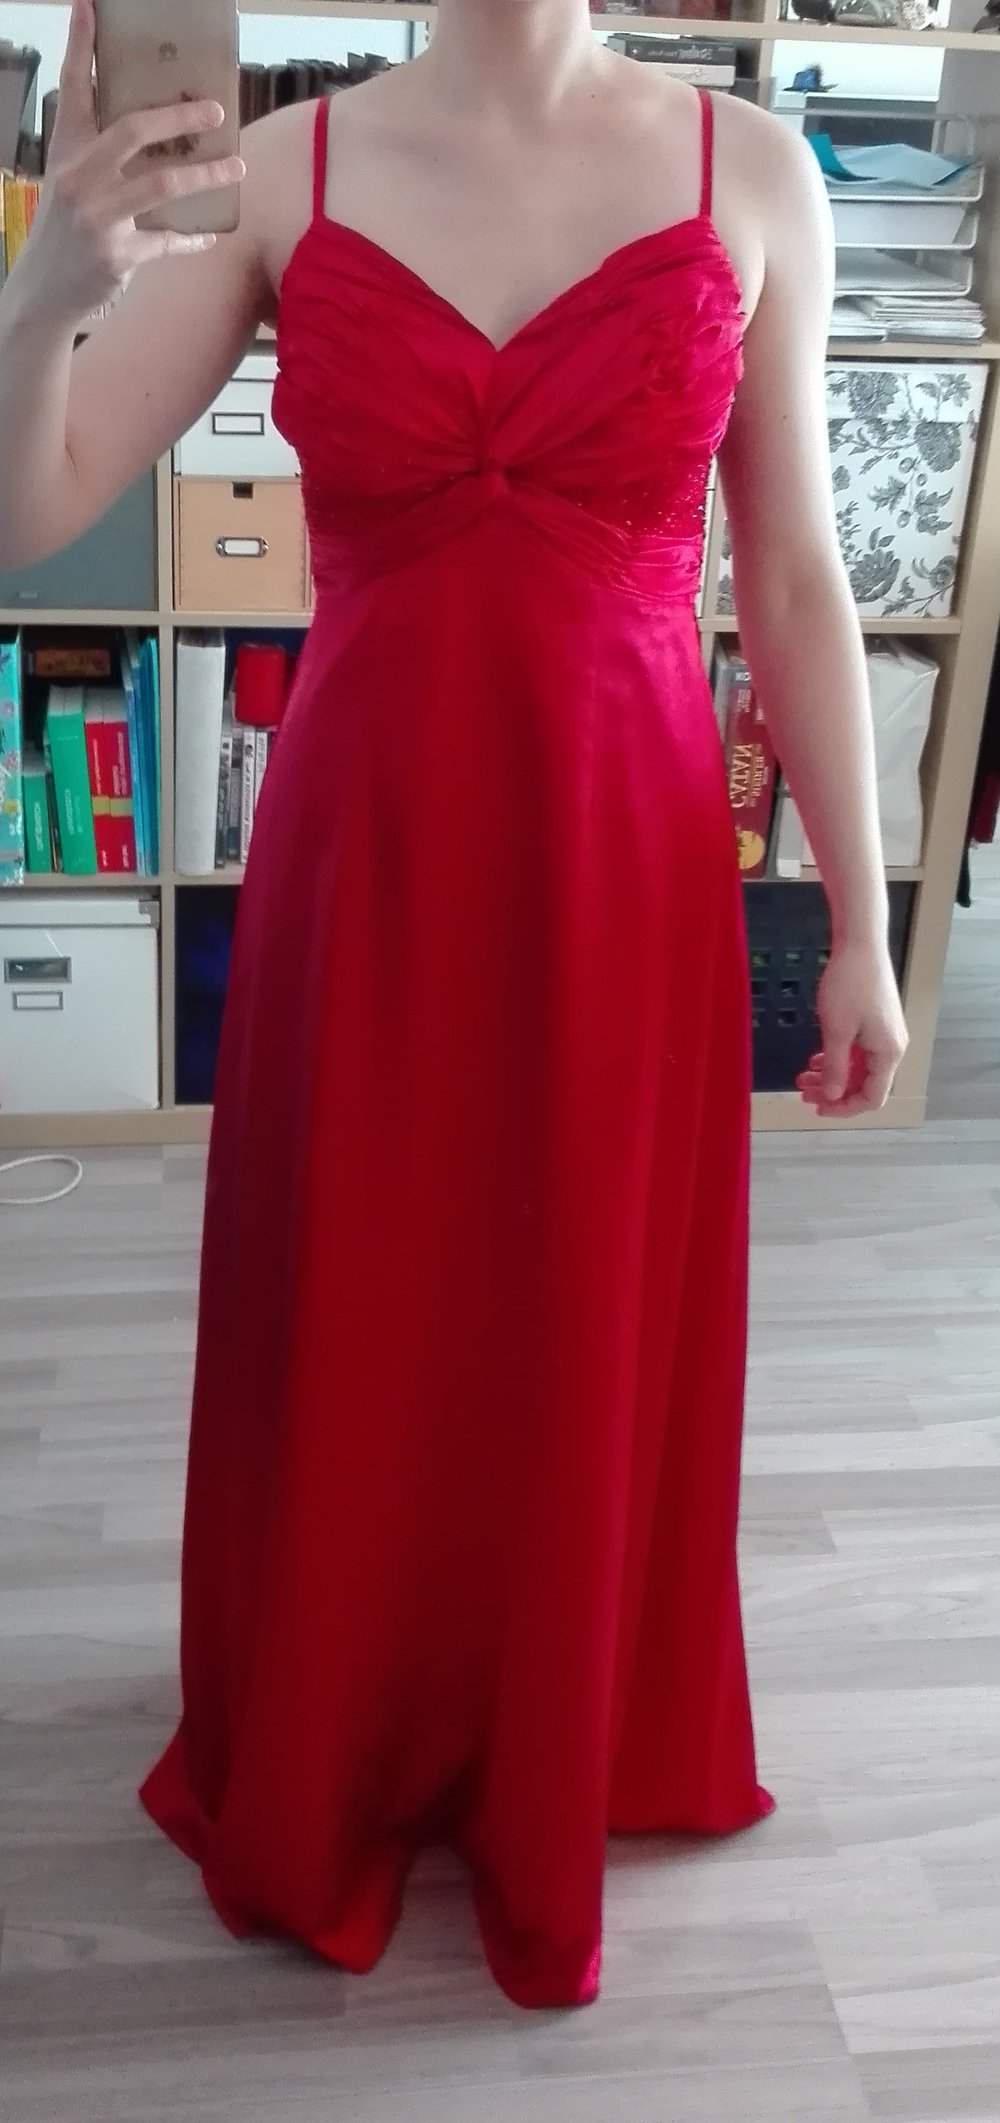 Traumhaftes rotes Abendkleid